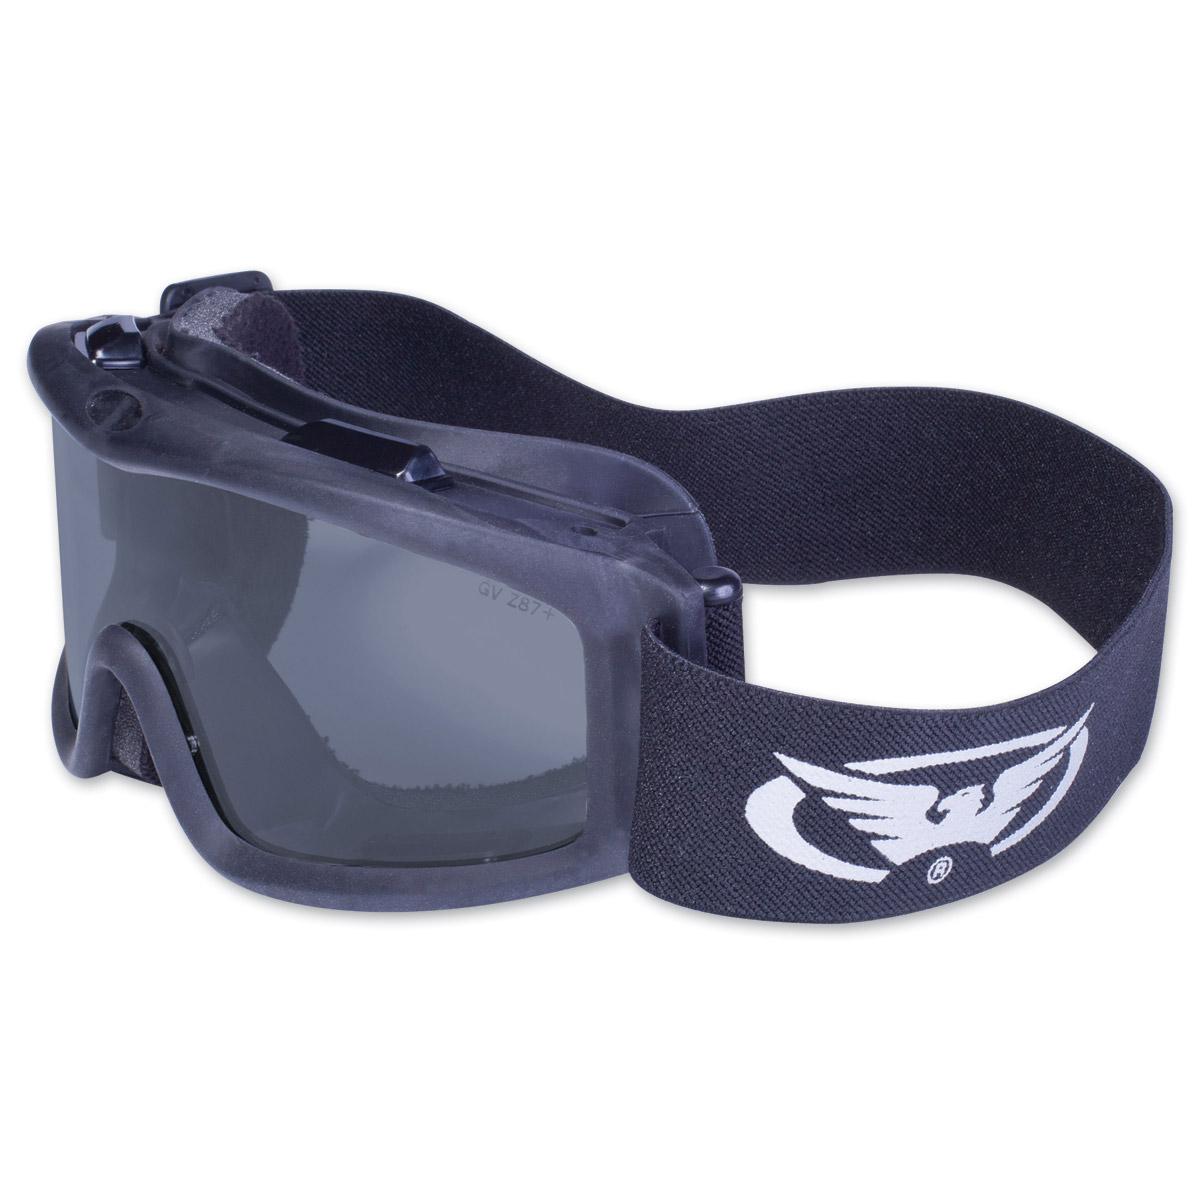 Global Vision Eyewear Ballistech 2 Black Goggles with Smoke Lens